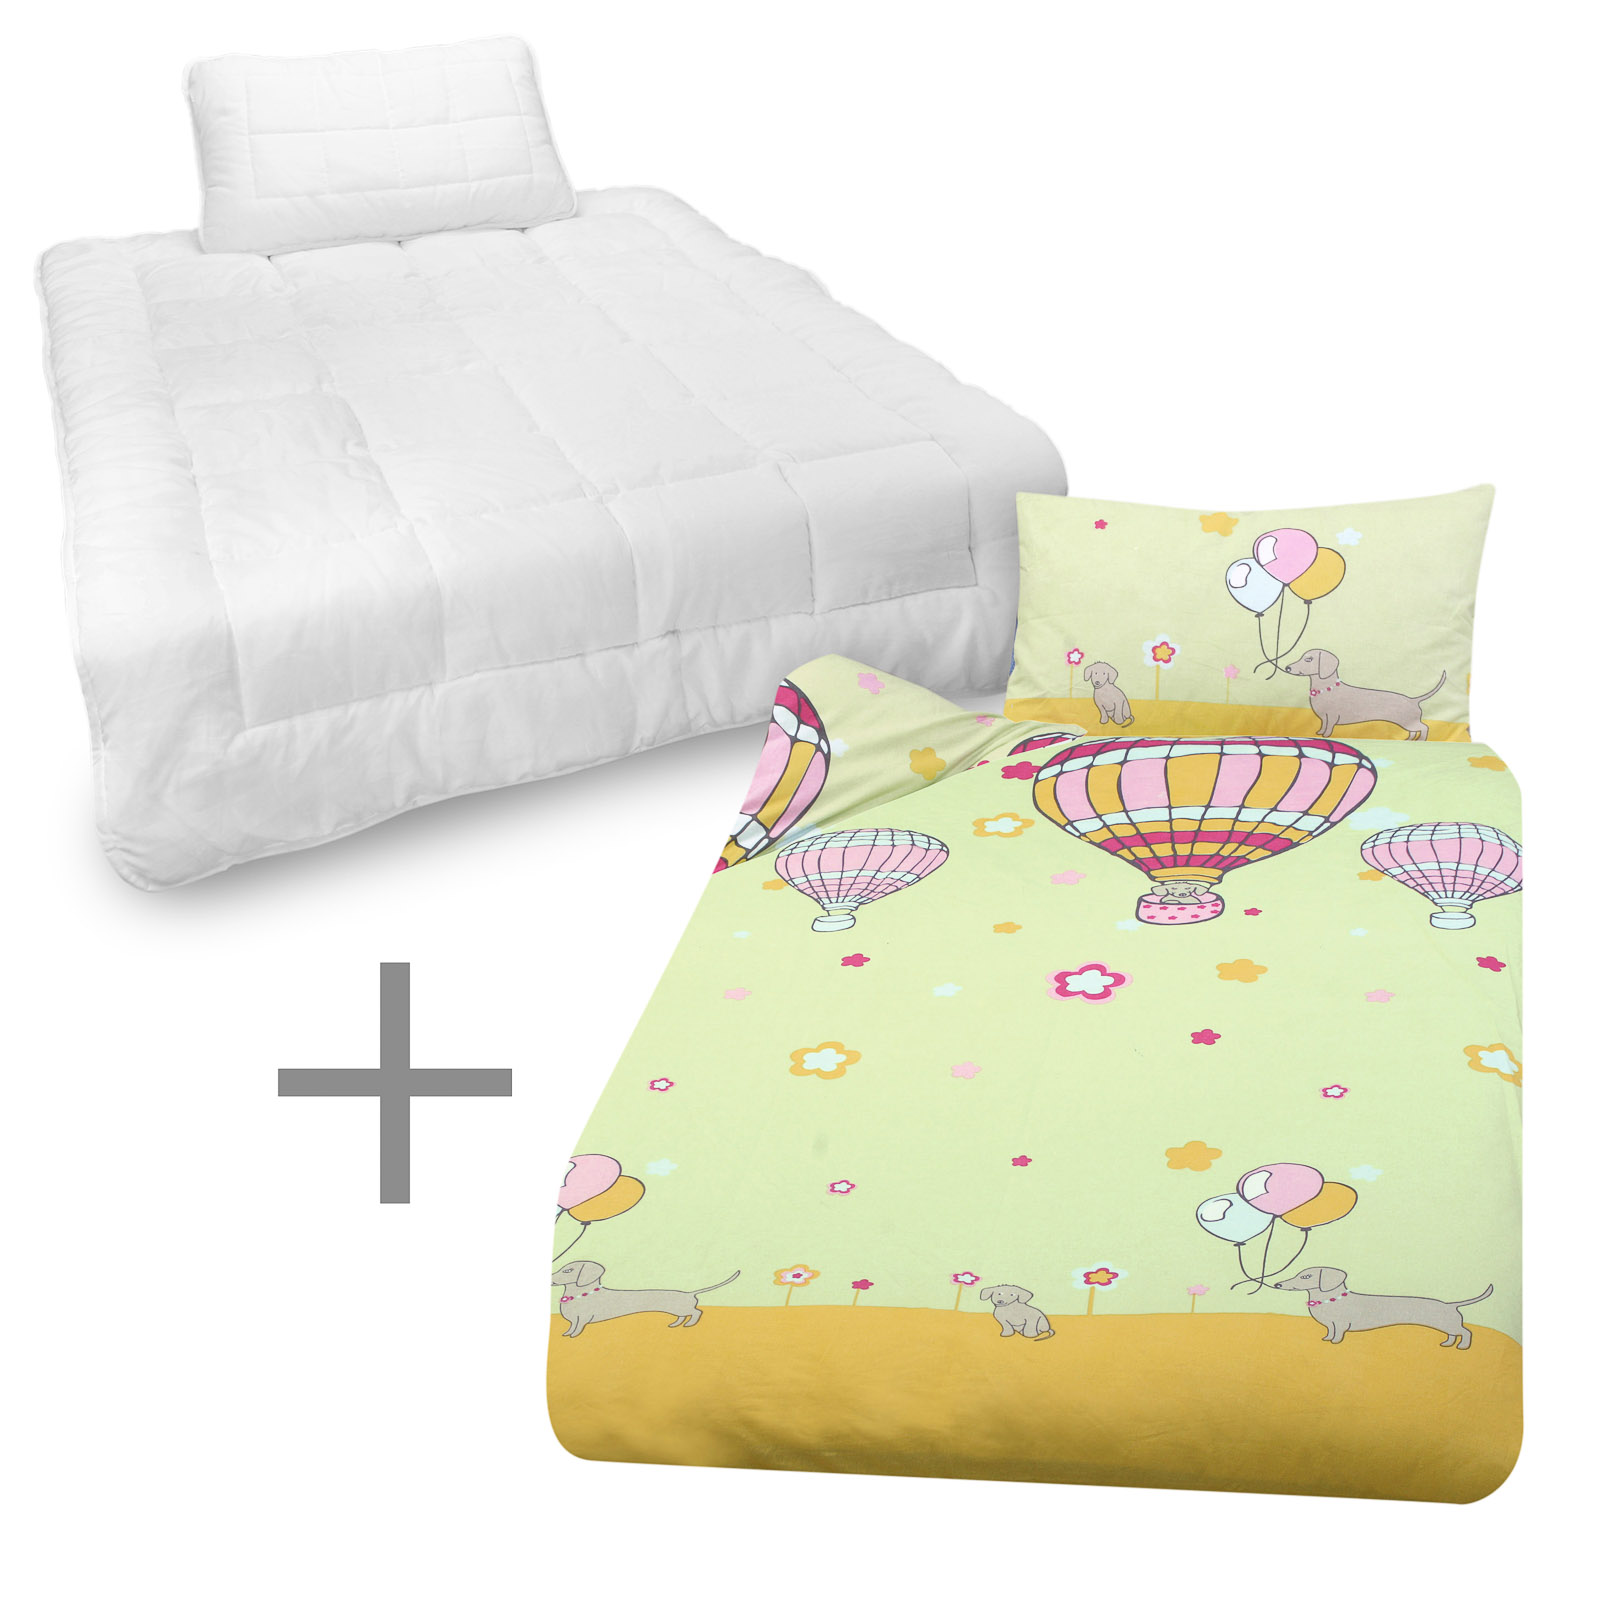 kinder bettw sche bettdecke kissen 135x100 40x60cm. Black Bedroom Furniture Sets. Home Design Ideas